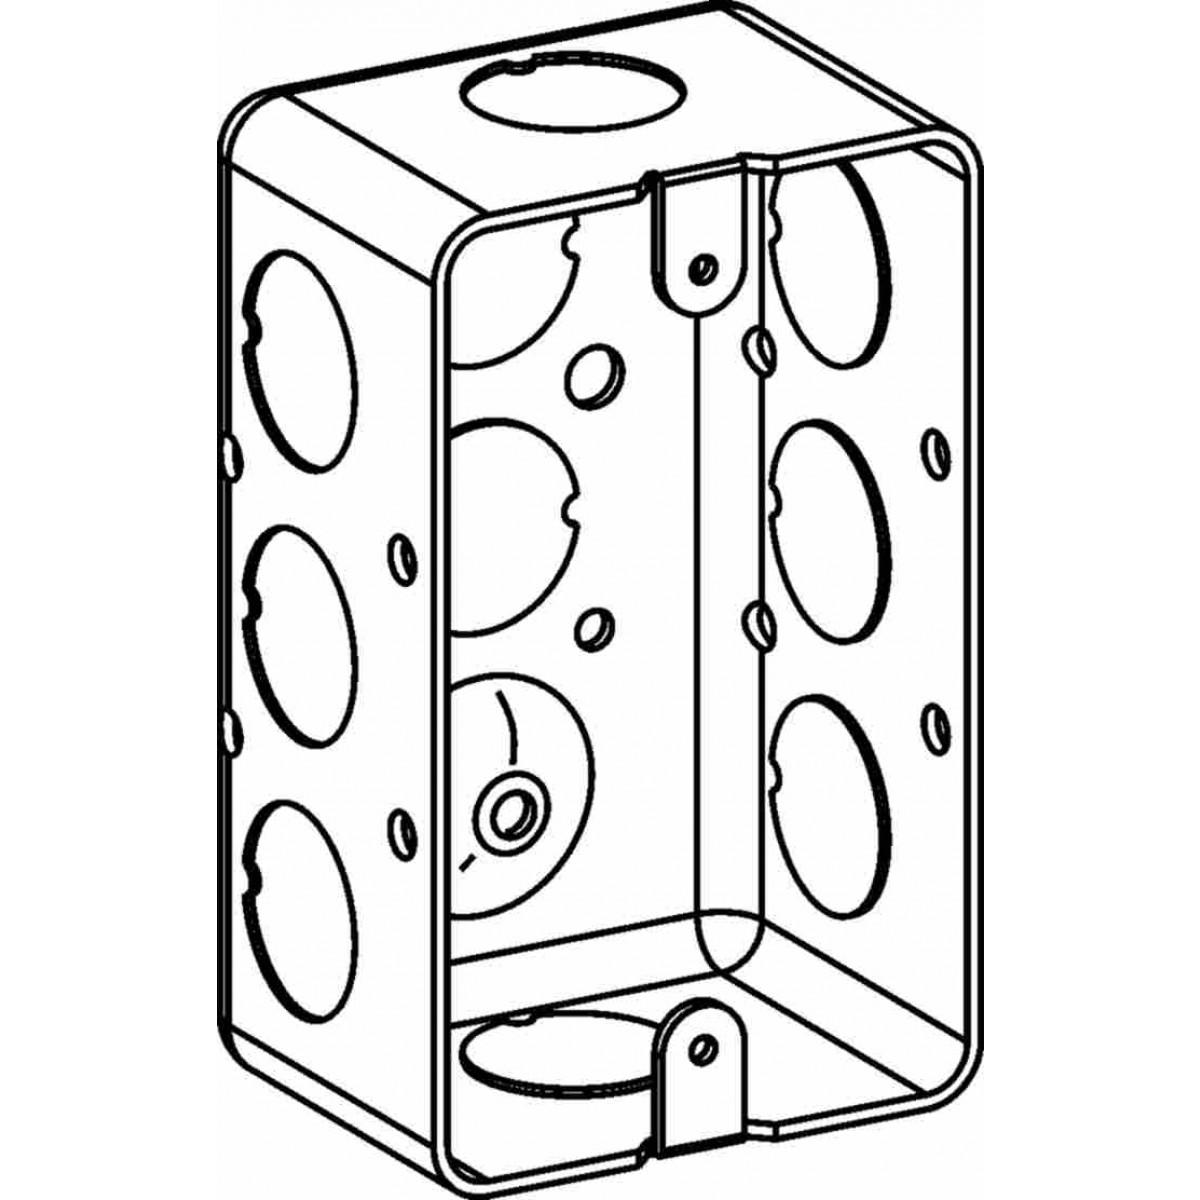 cantex pvc type fsc outlet box  u2013 cableorganizer